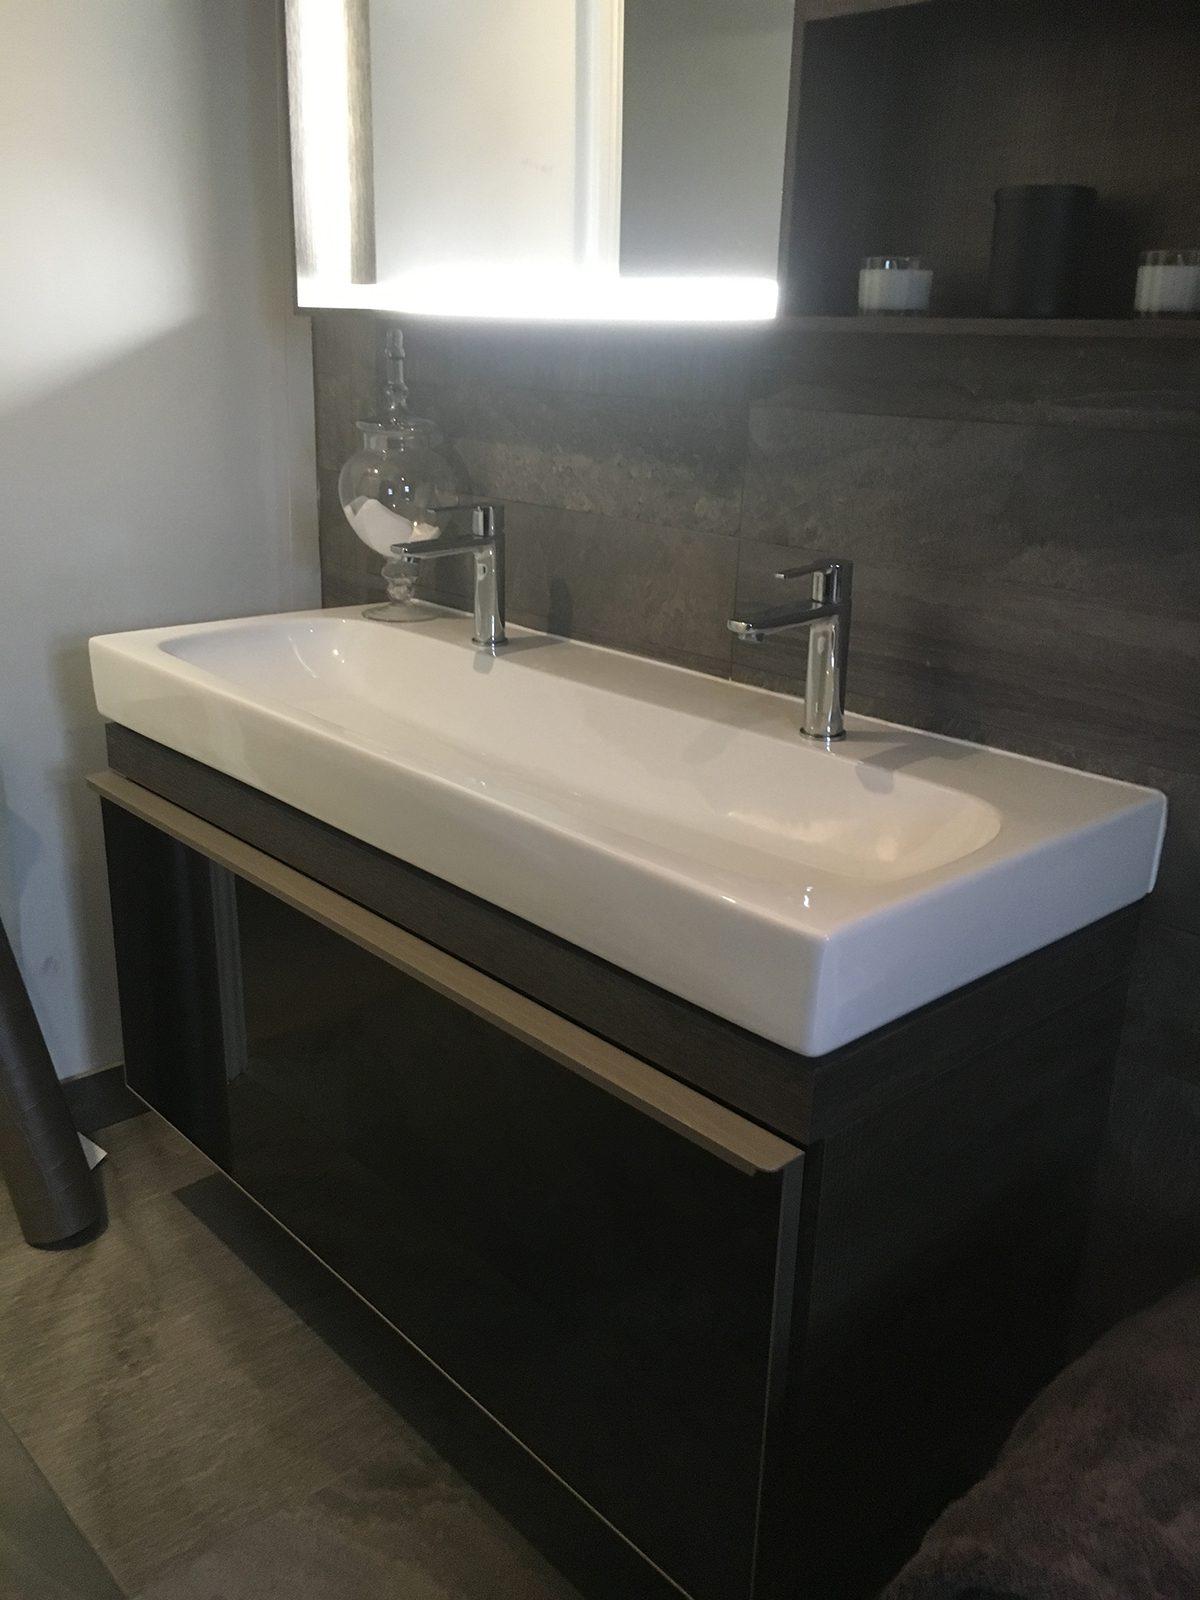 The Cambridge Bath Co bathroom sink large